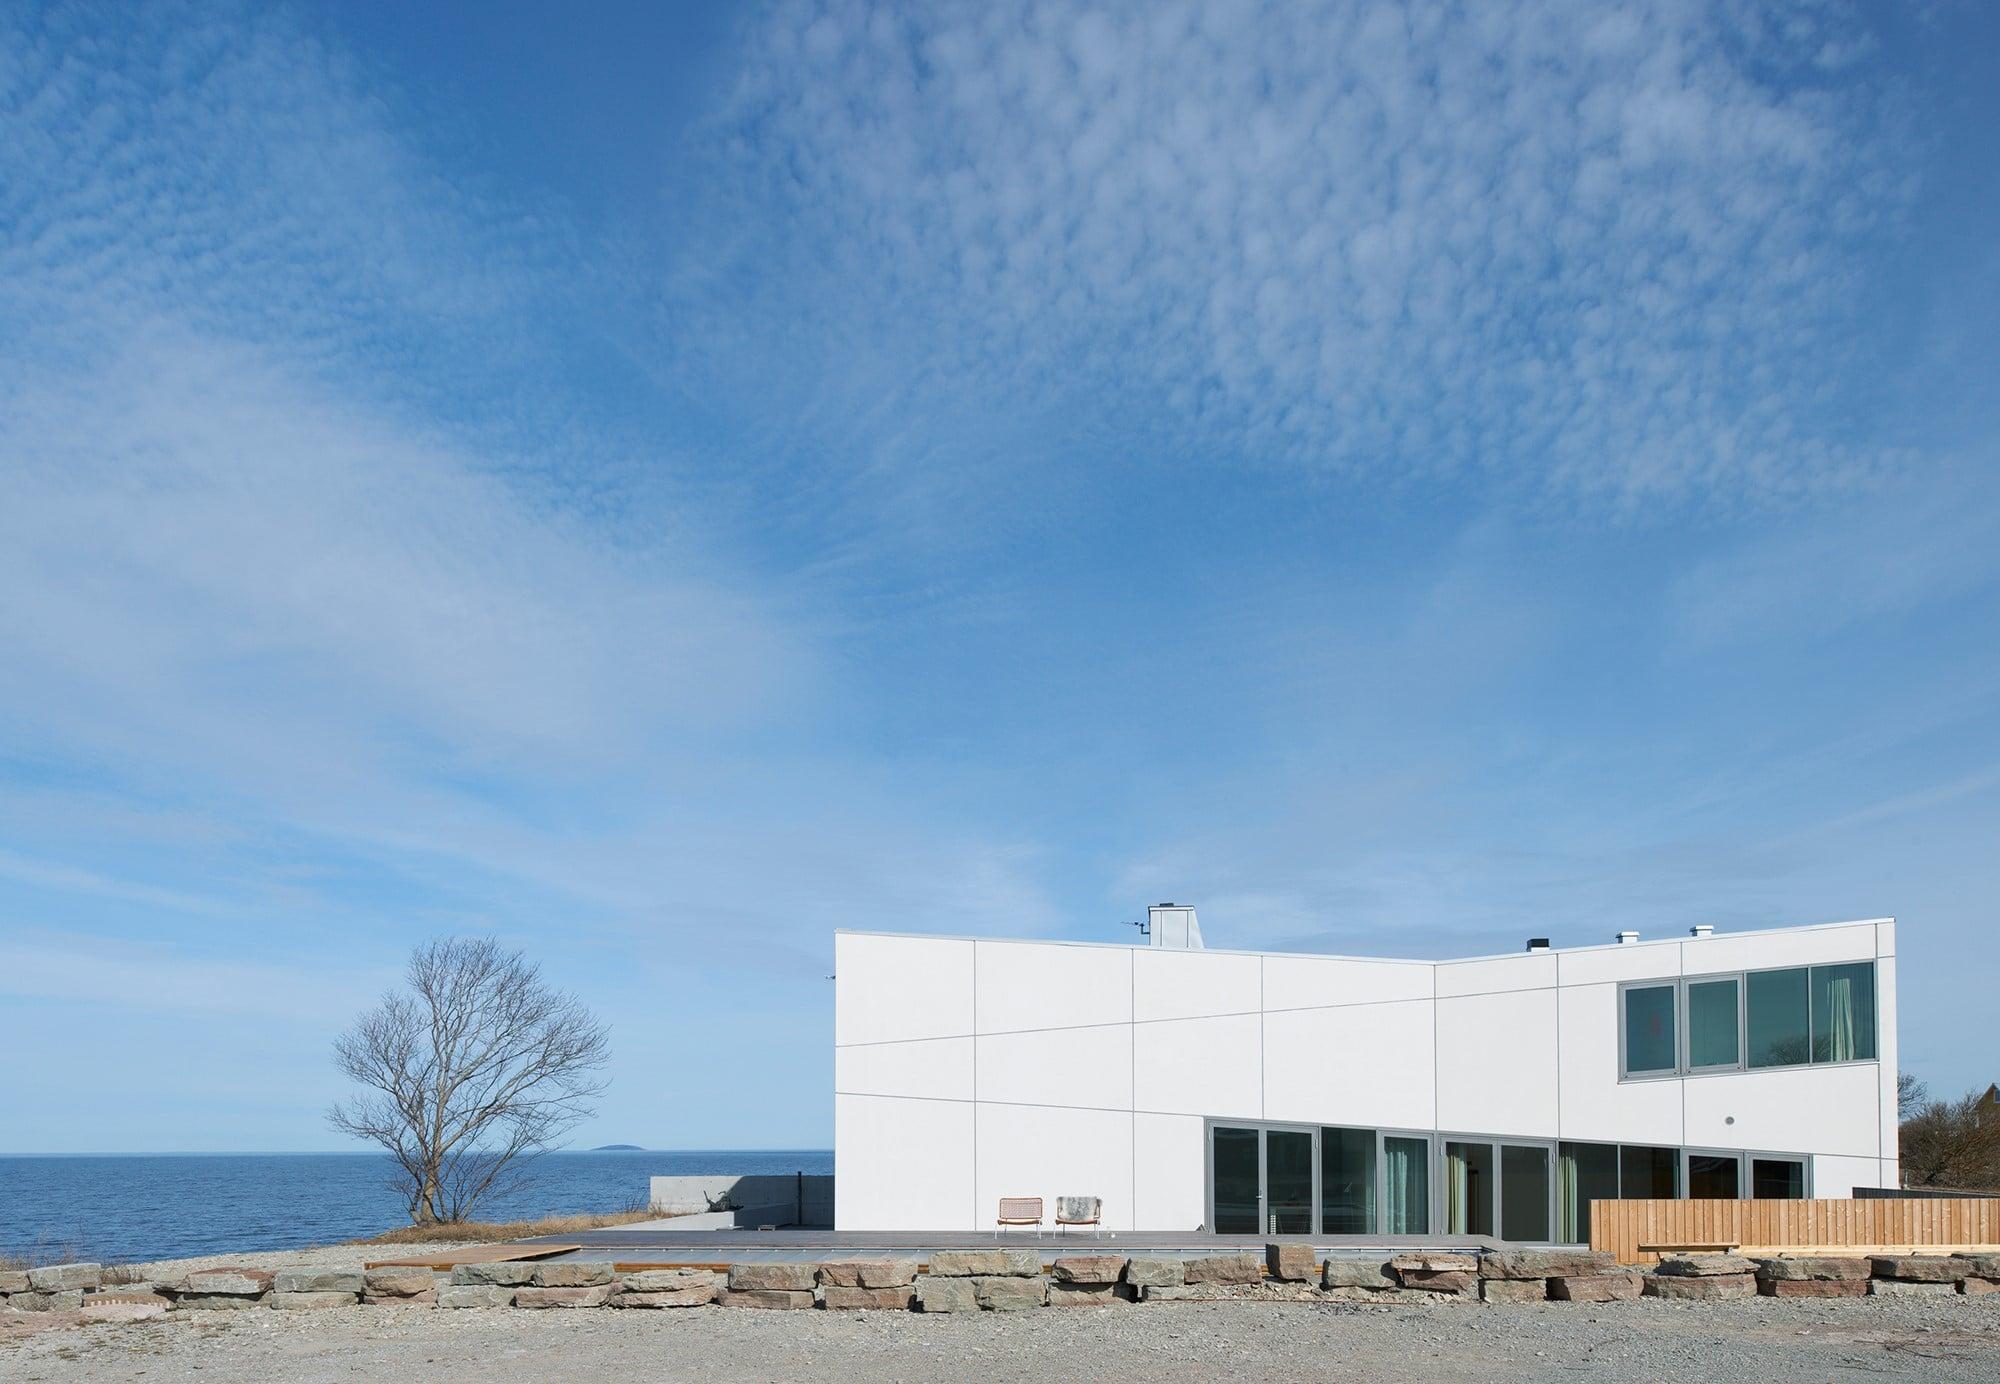 CKRの代表的作品の一つ、「ヴィラ・ヴィードルンド」。スウェーデンのアート・コレクター、ヤン・ヴィードルンドの個人宅で海辺に建つ。